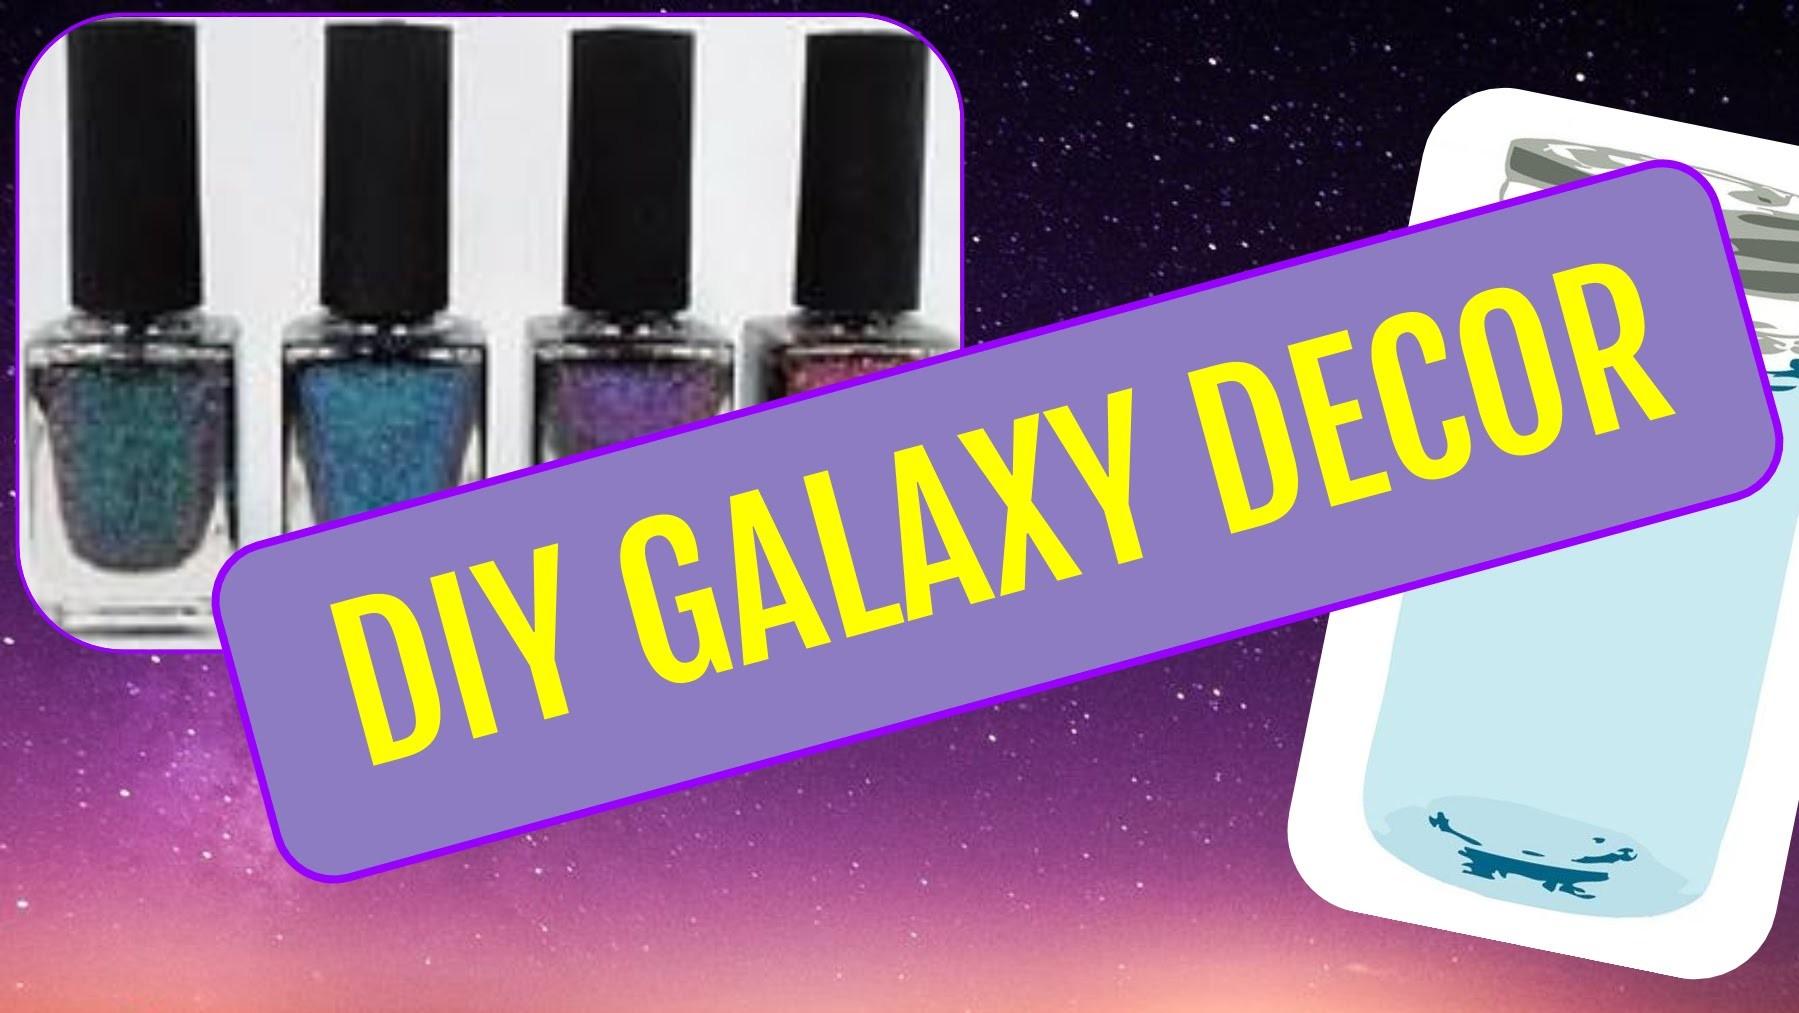 DIY GALAXY DECOR! | Mason Jar, Wall Art, + More! | #heyitsdiy